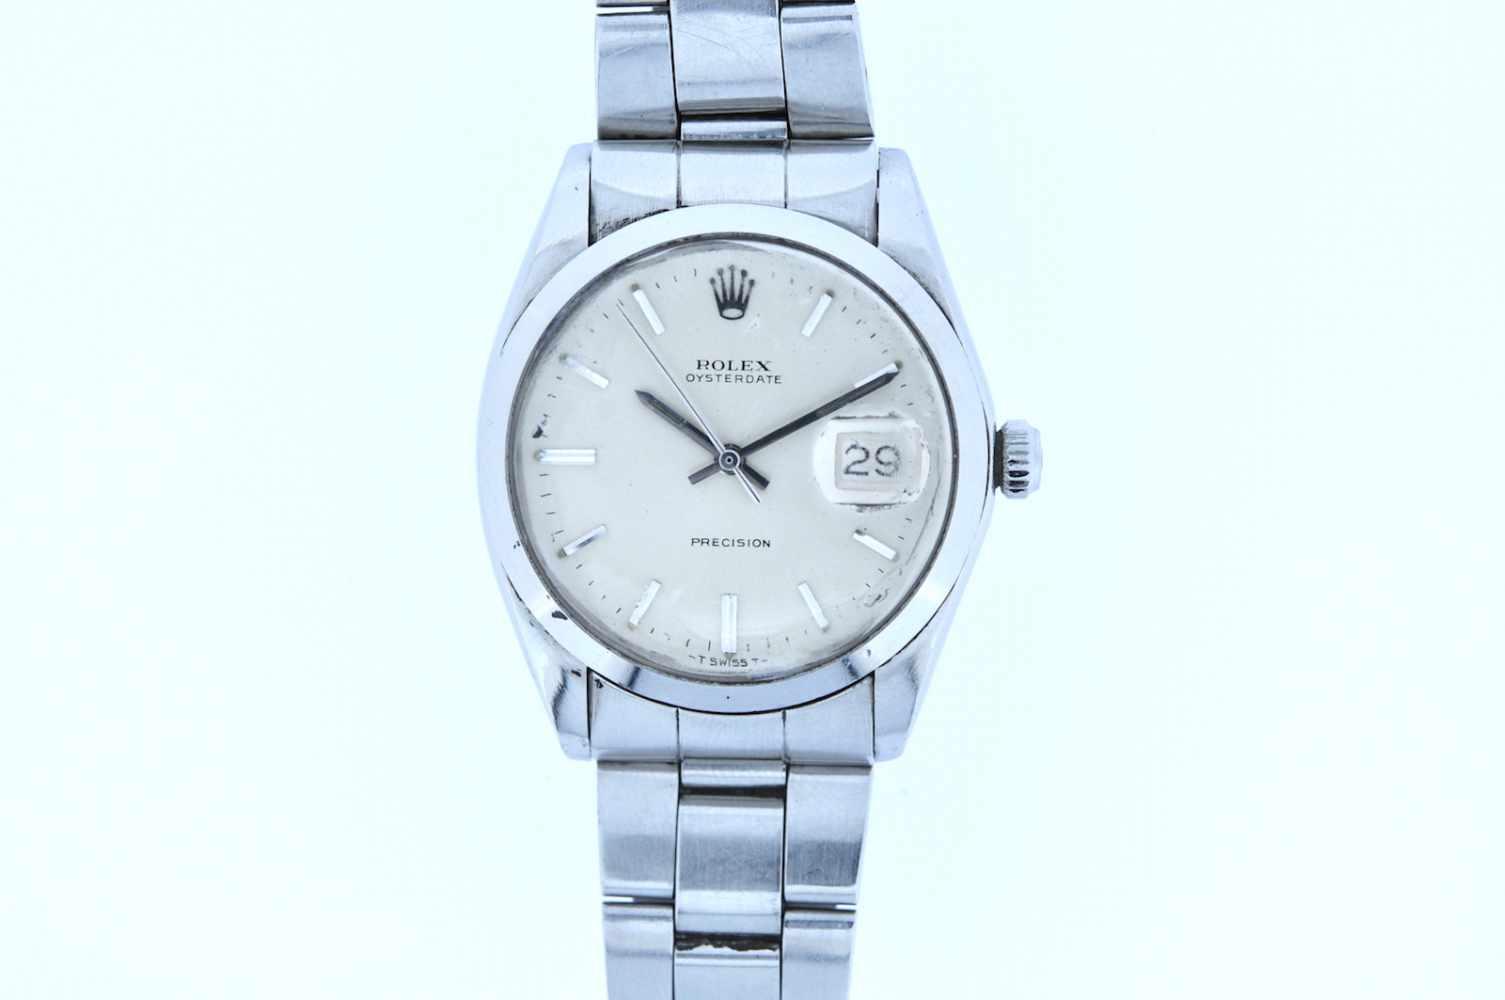 Rolex Rolex Date Precision, Ref.6694, Stahl/Stahl, Oysterband, Handaufzug, Plexiglas, Glas stark